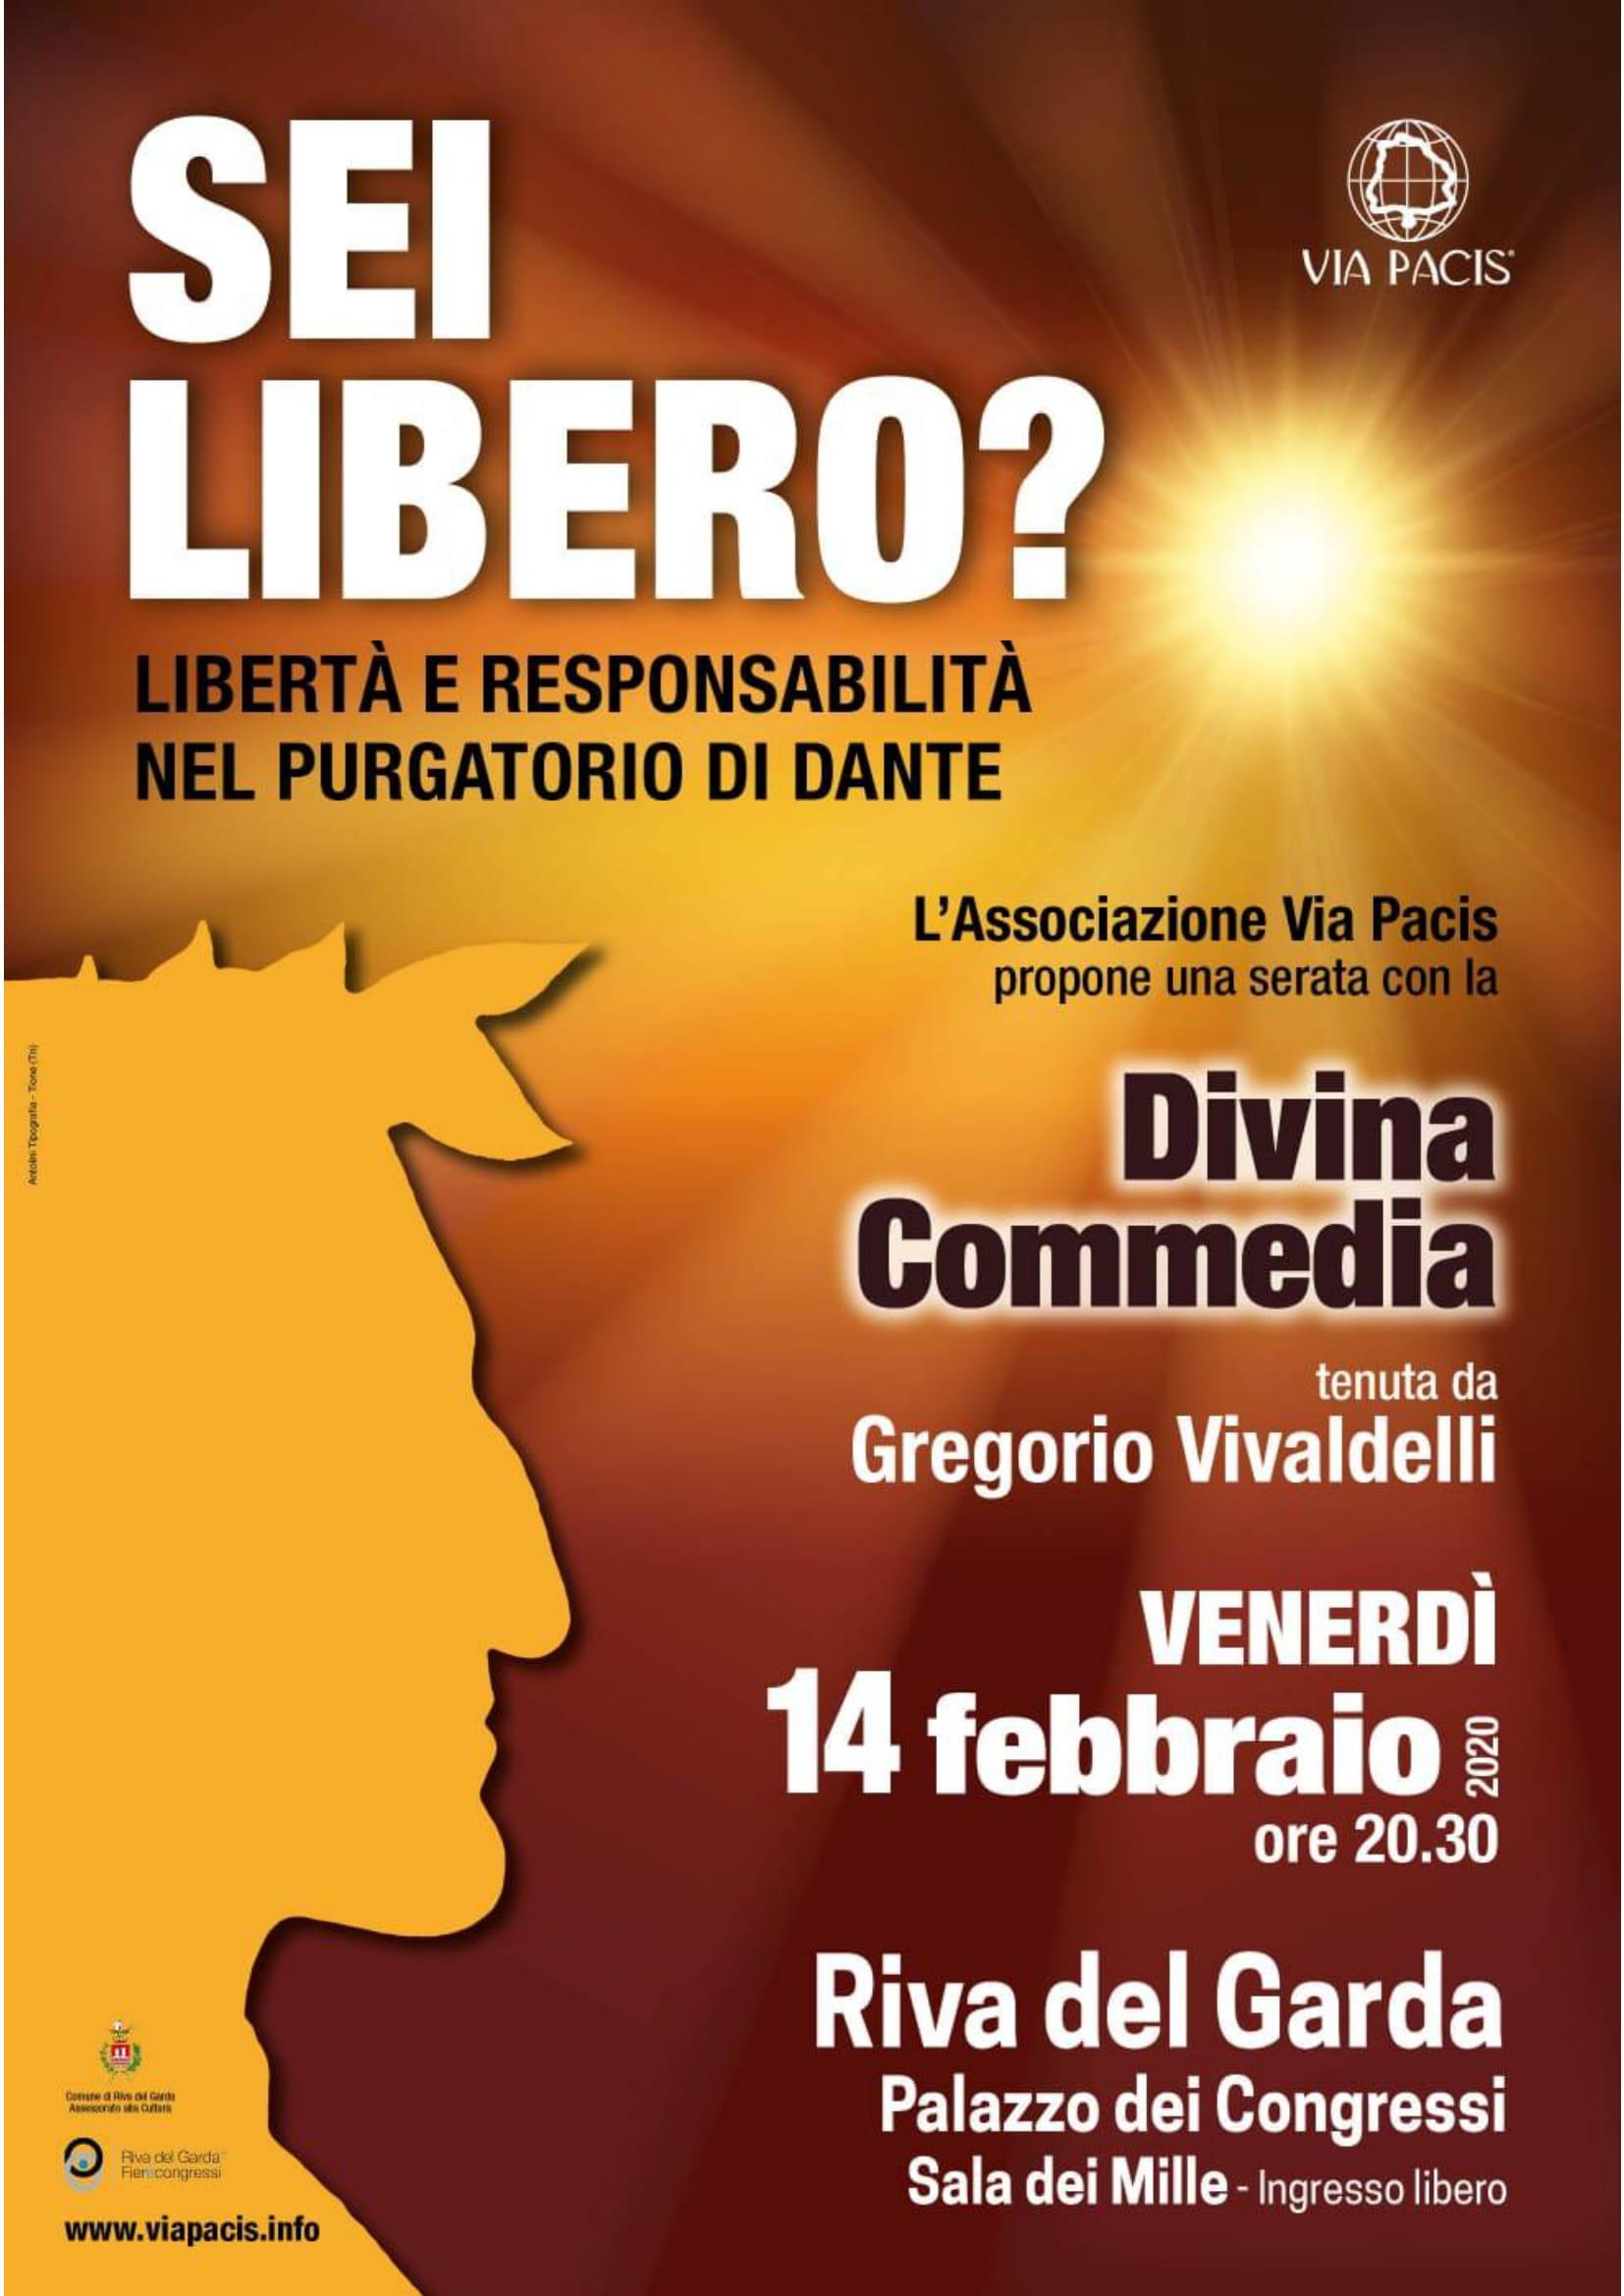 Divina Commedia 14 feb 2020 Riva-1